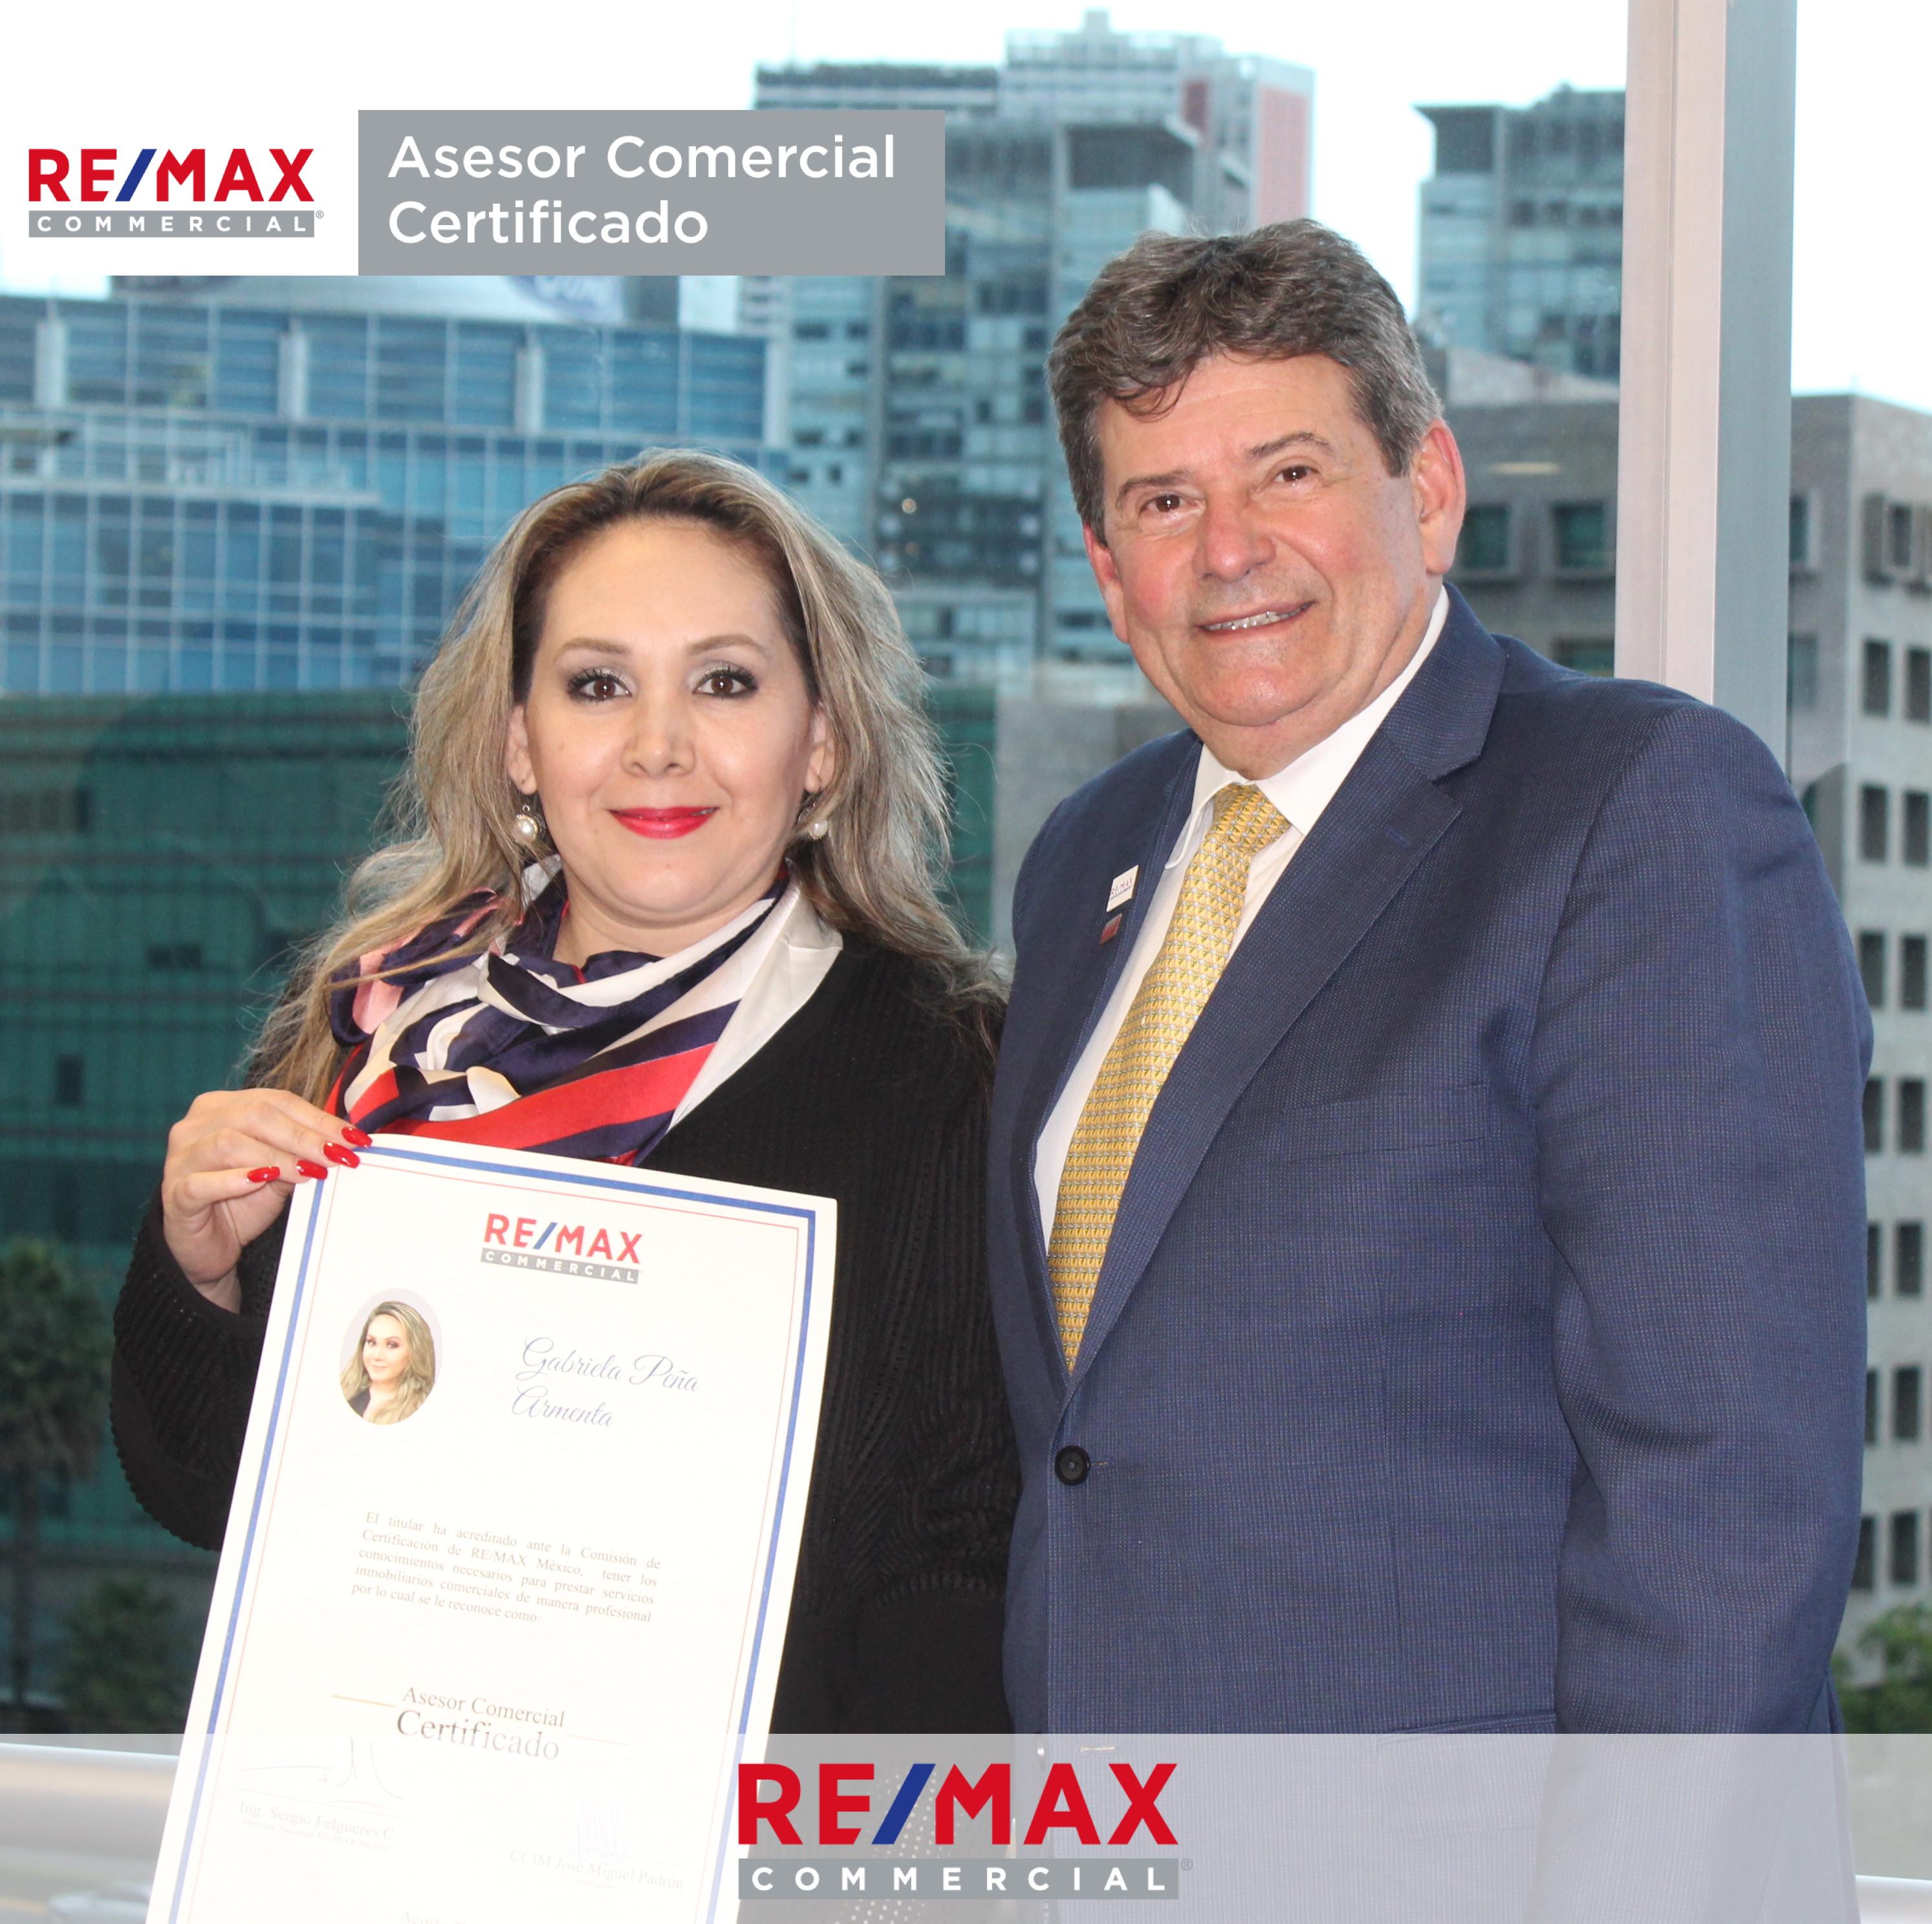 04_Certificacion_comercial_comprar_rentar_vender_casa_departamento_franquicias_inmobiliarias_REMAX_mexico_propiedades_comerciales_terrenos_bodegas